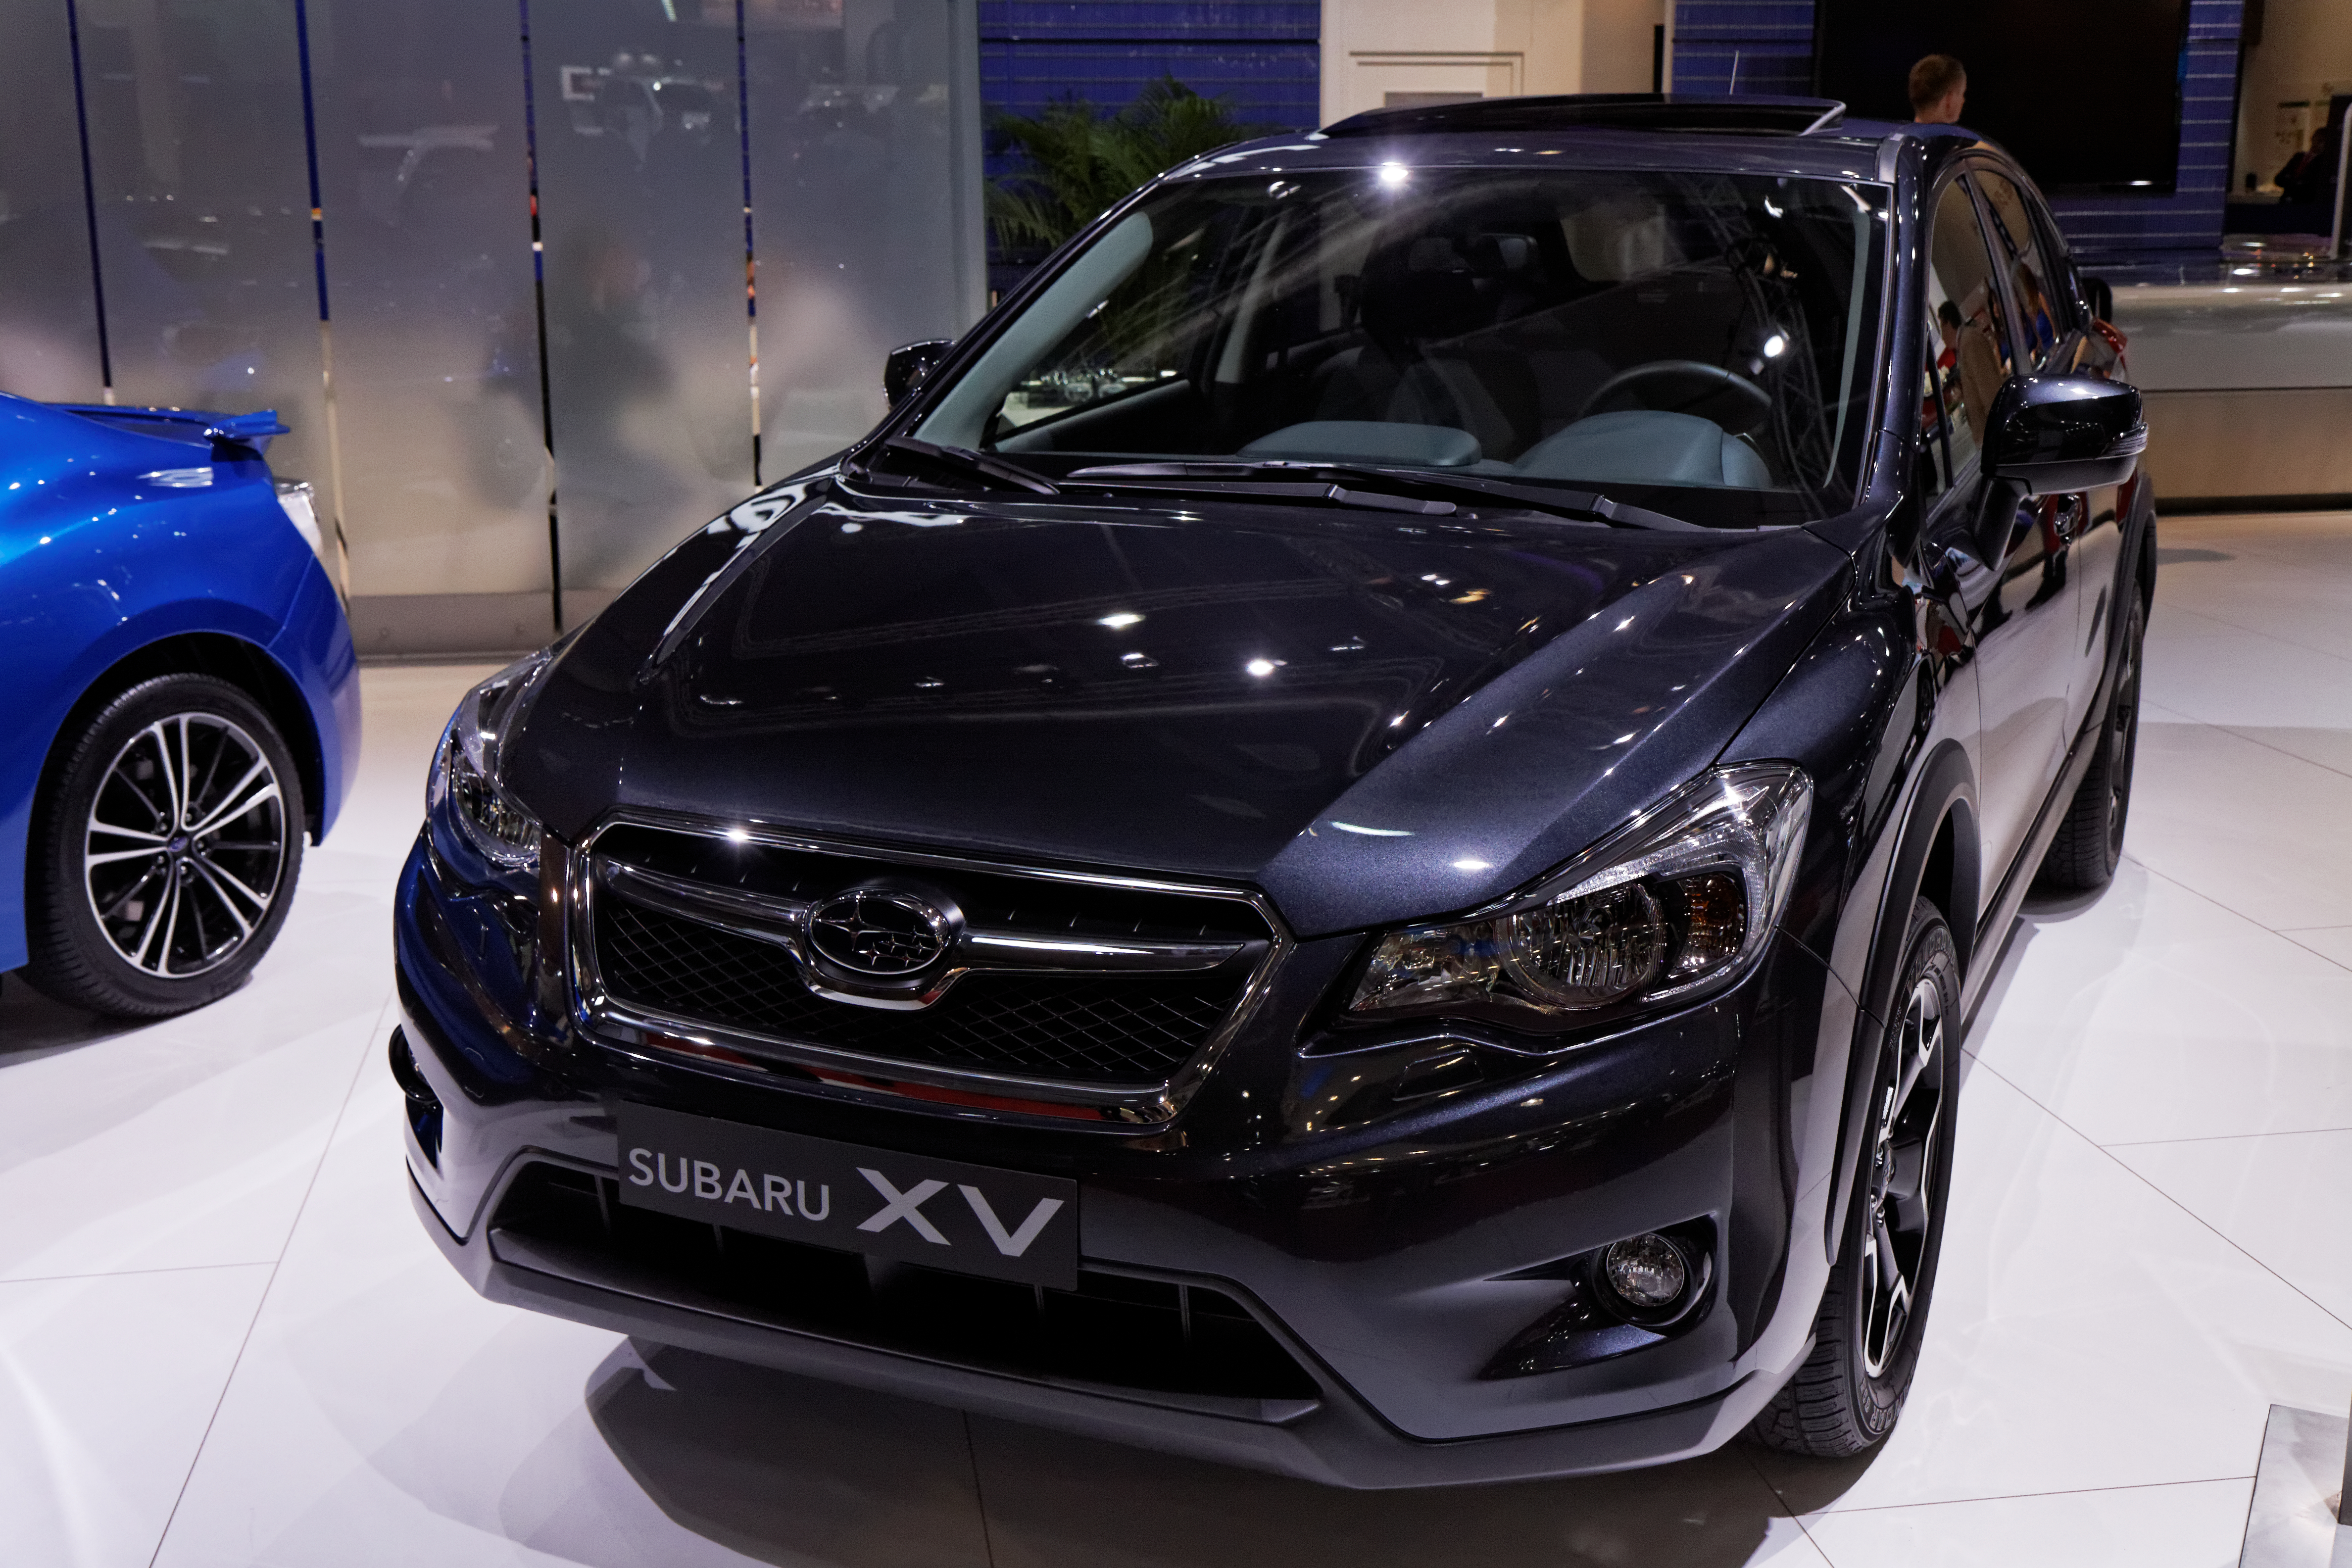 Specs For 2015 Subaru Crosstrek.html | Autos Weblog